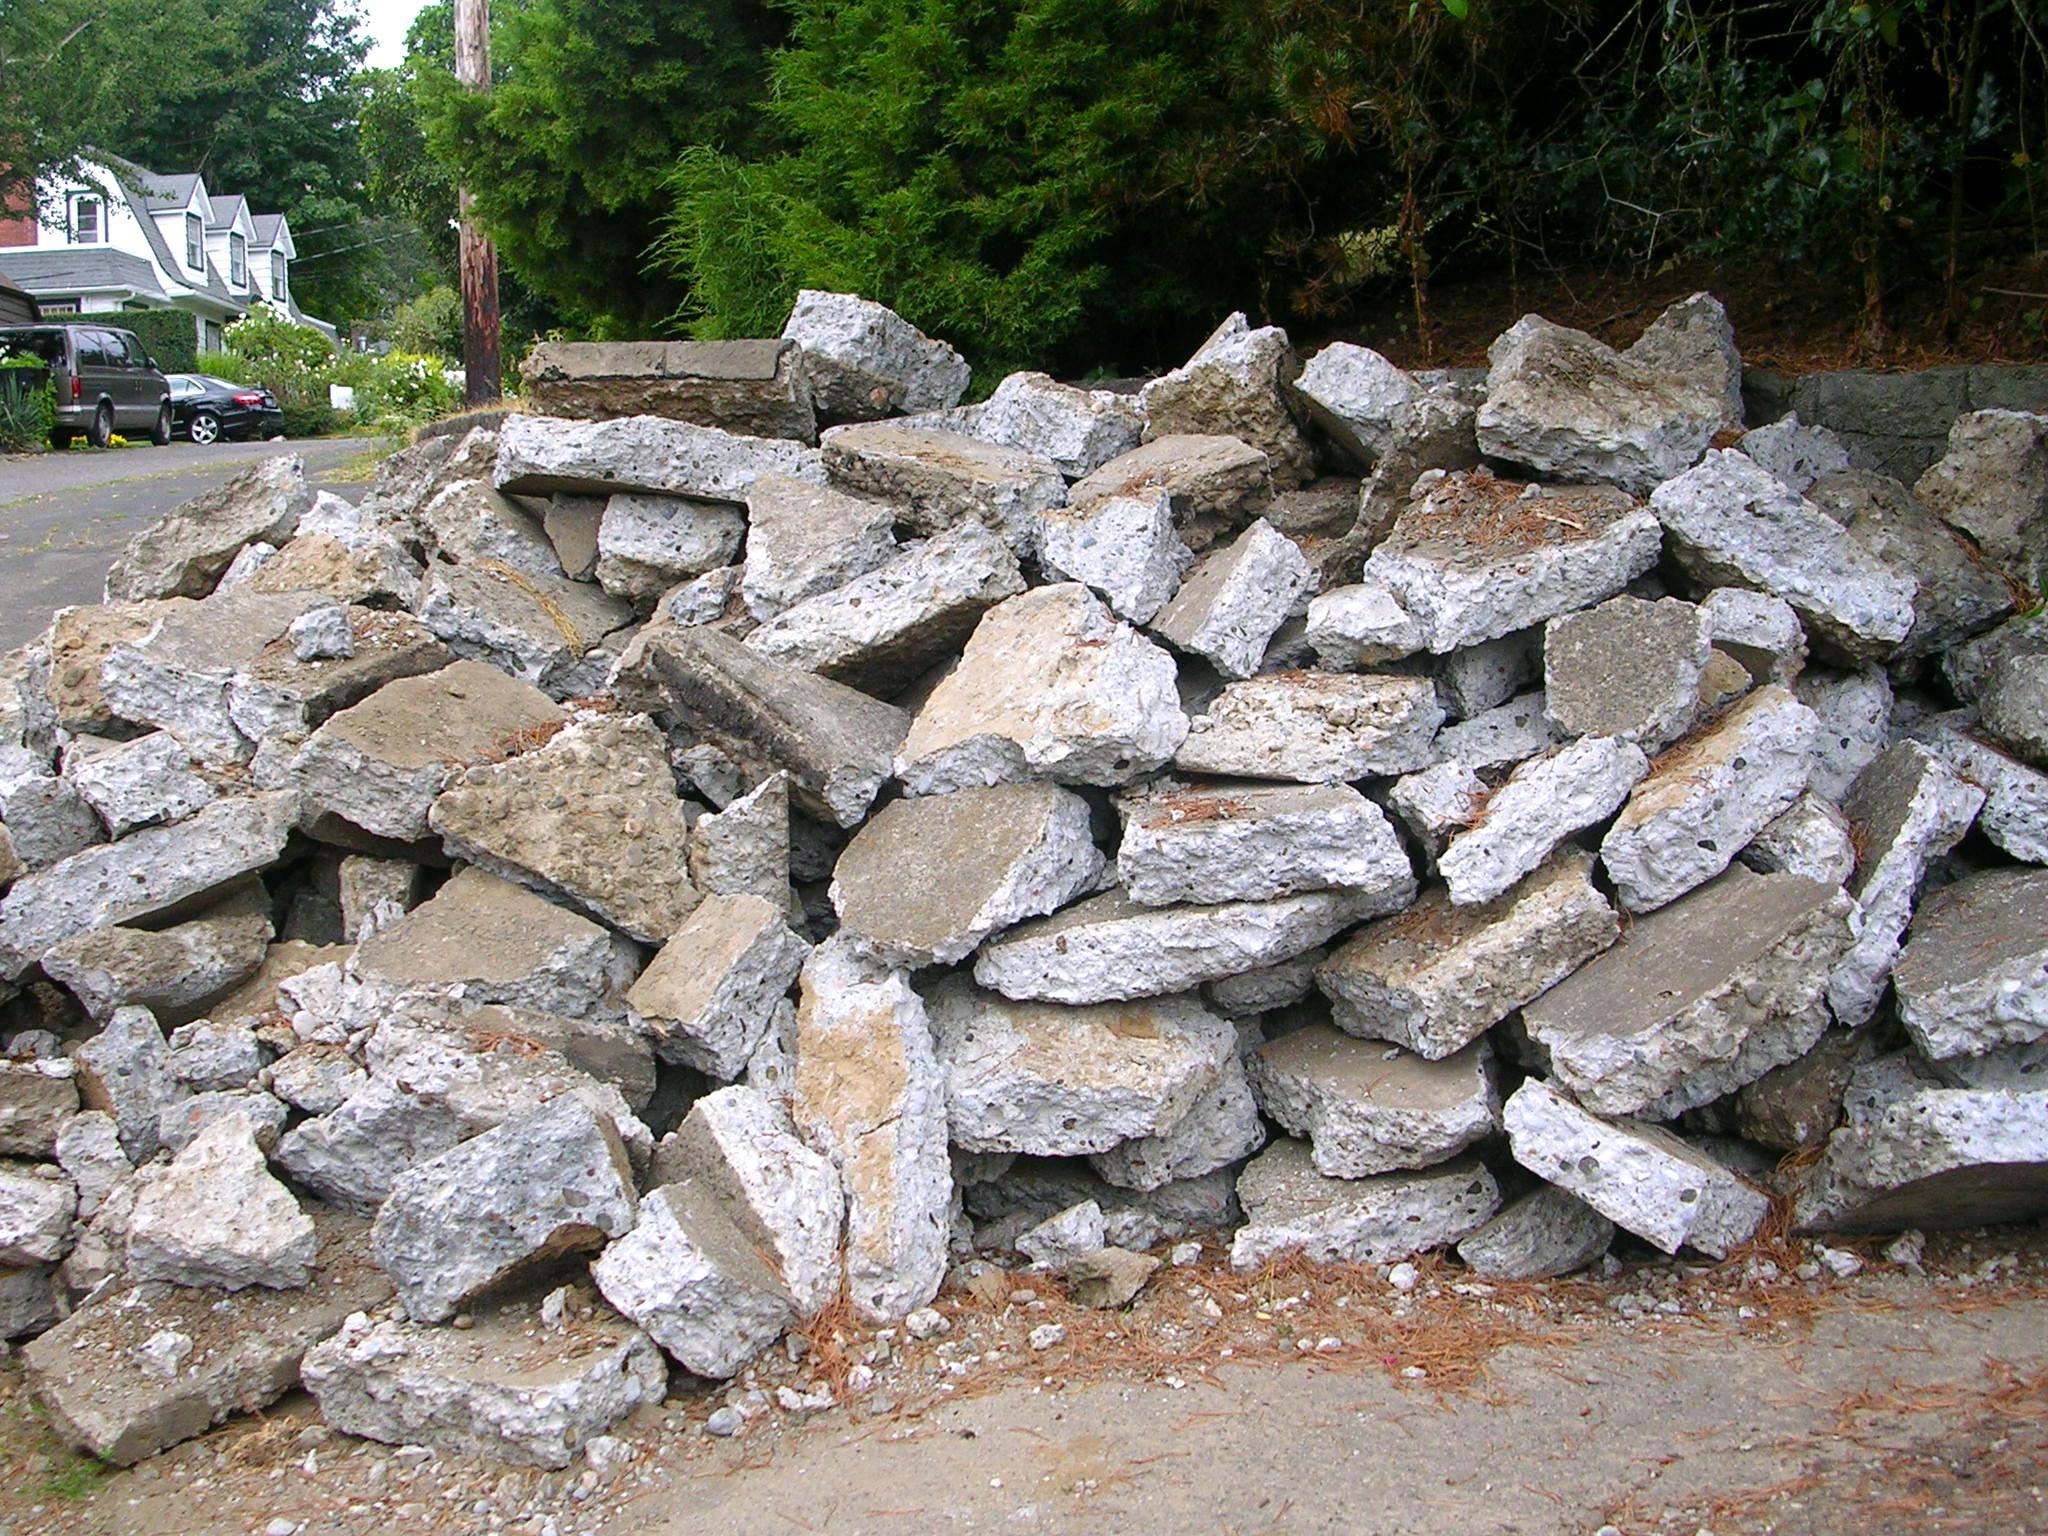 Old concrete block photo